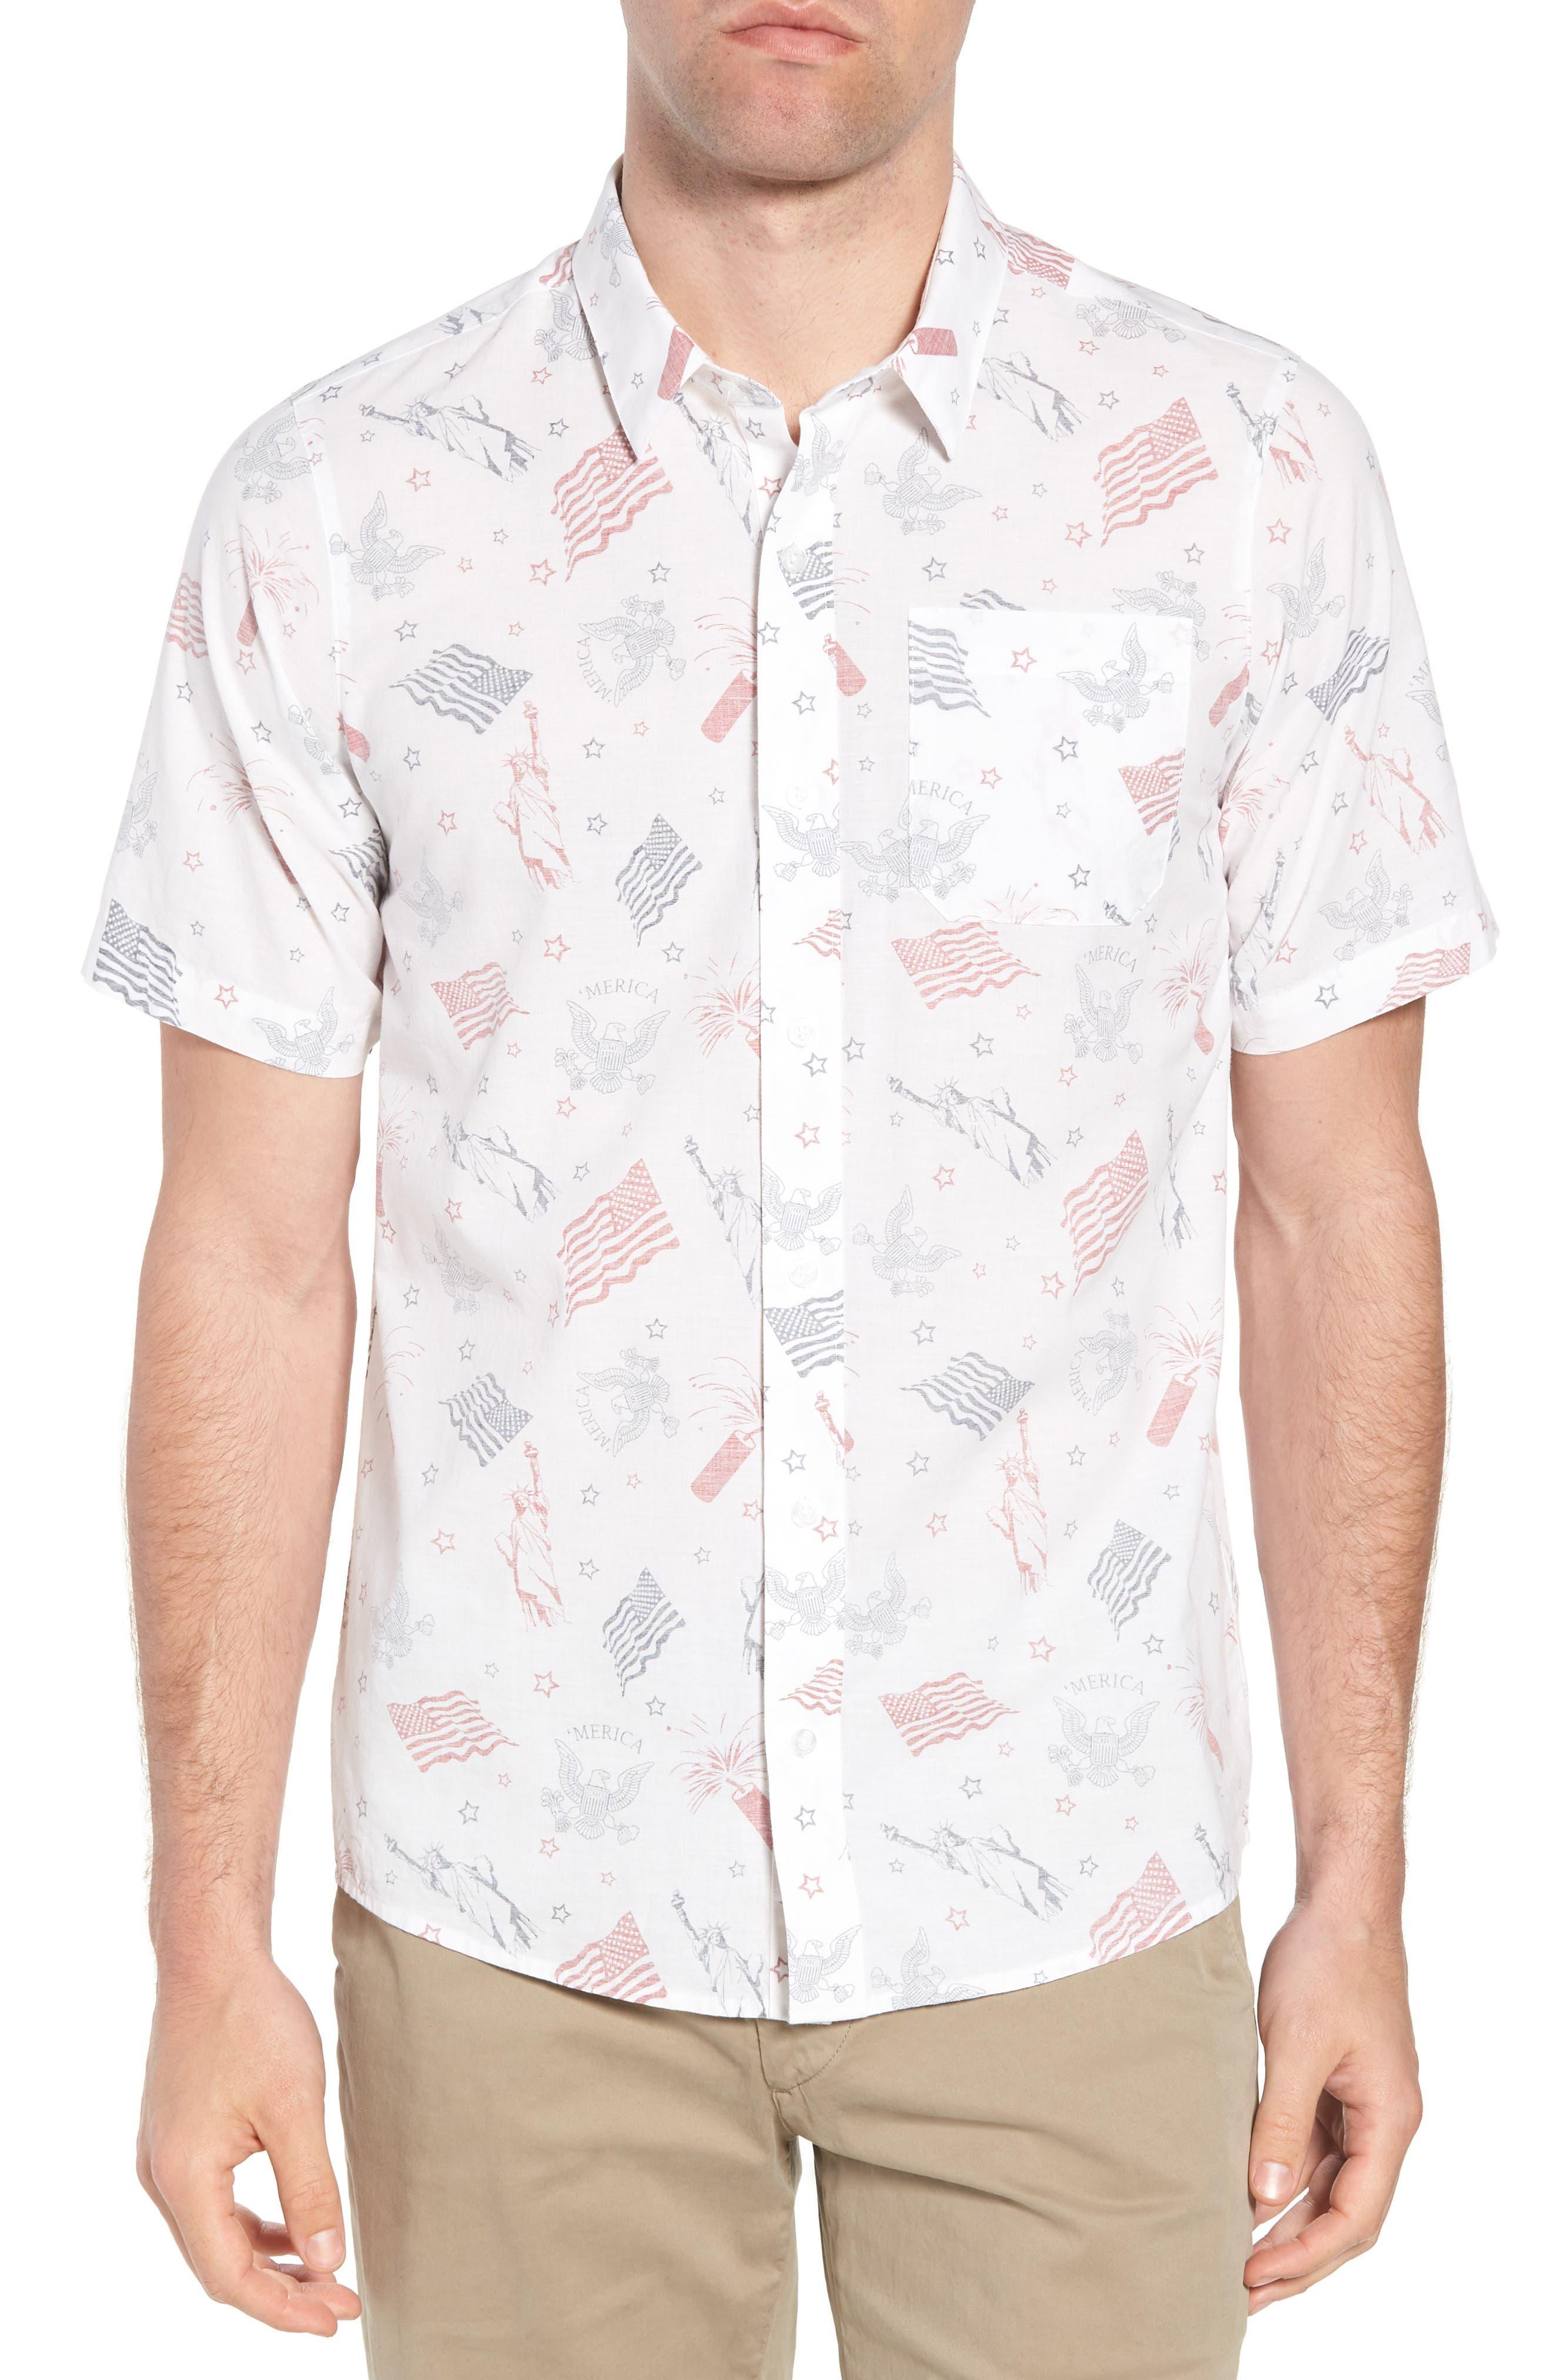 Black Cat Regular Fit Short Sleeve Sport Shirt,                             Main thumbnail 1, color,                             White